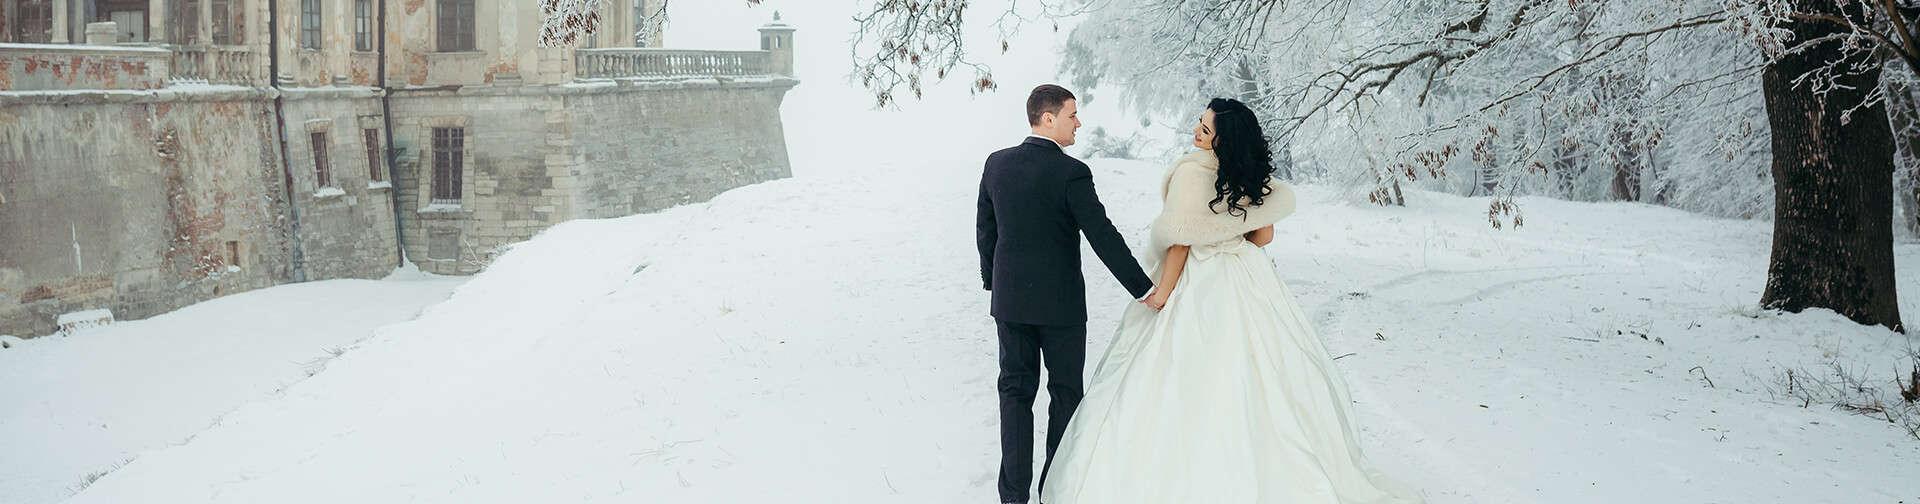 Matrimonio Invernale Uomo : Matrimonio invernale